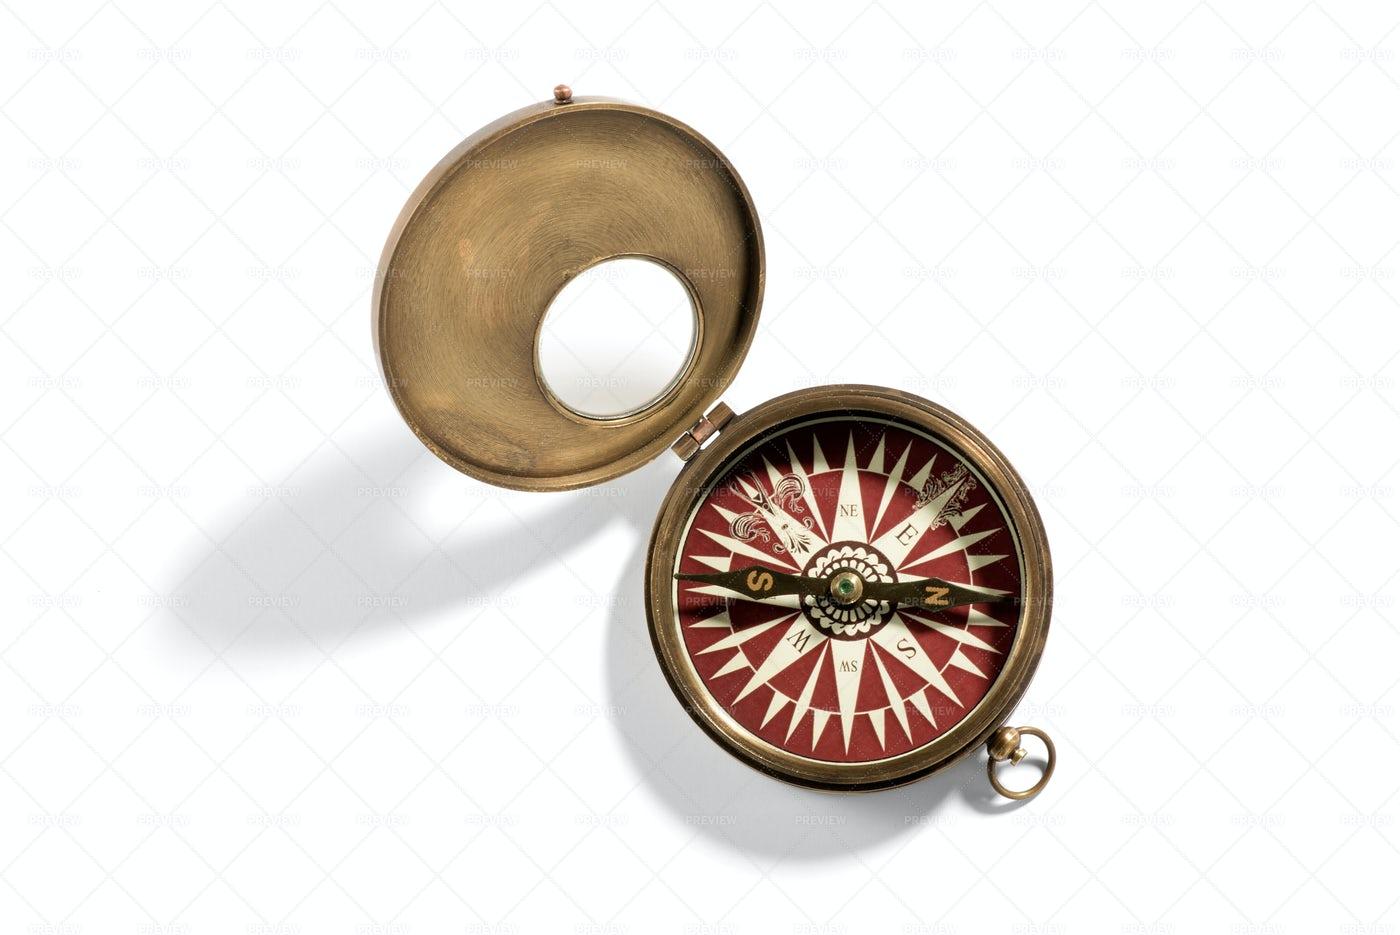 Vintage Portable Hand Compass: Stock Photos